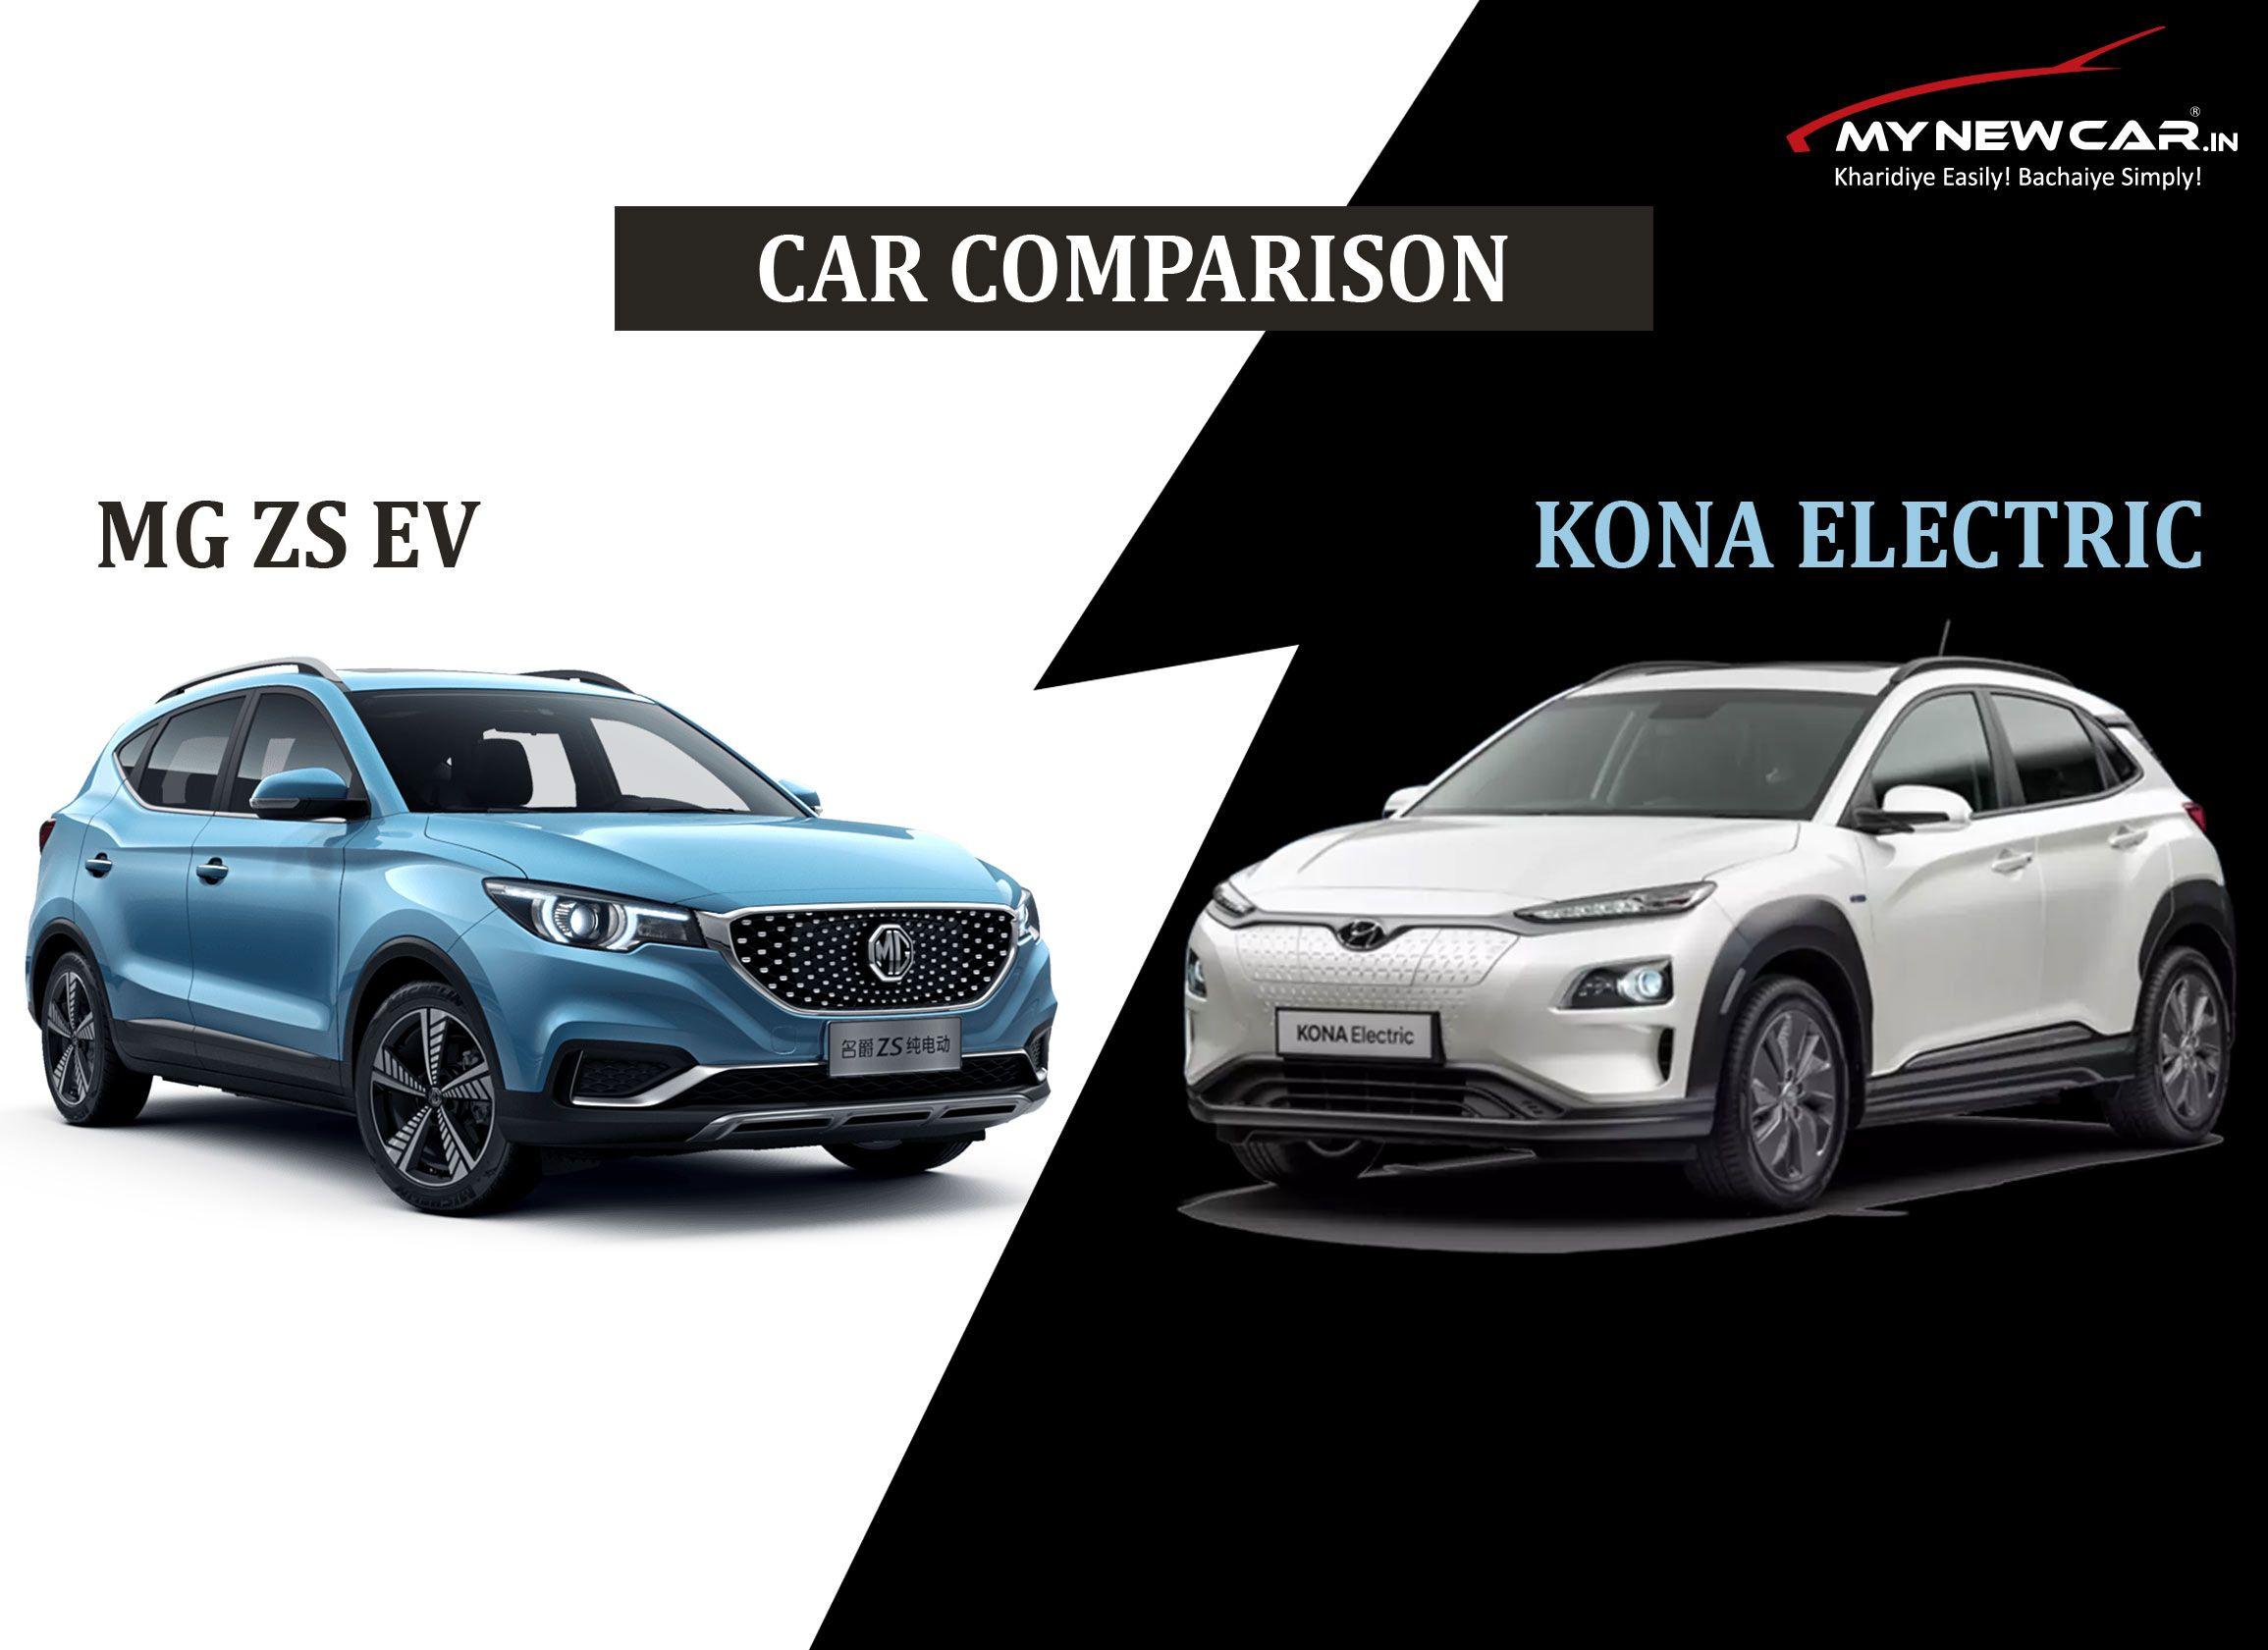 Car Comparison Mg Zs Ev Vs Hyundai Kona In 2020 Hyundai Car Comparison